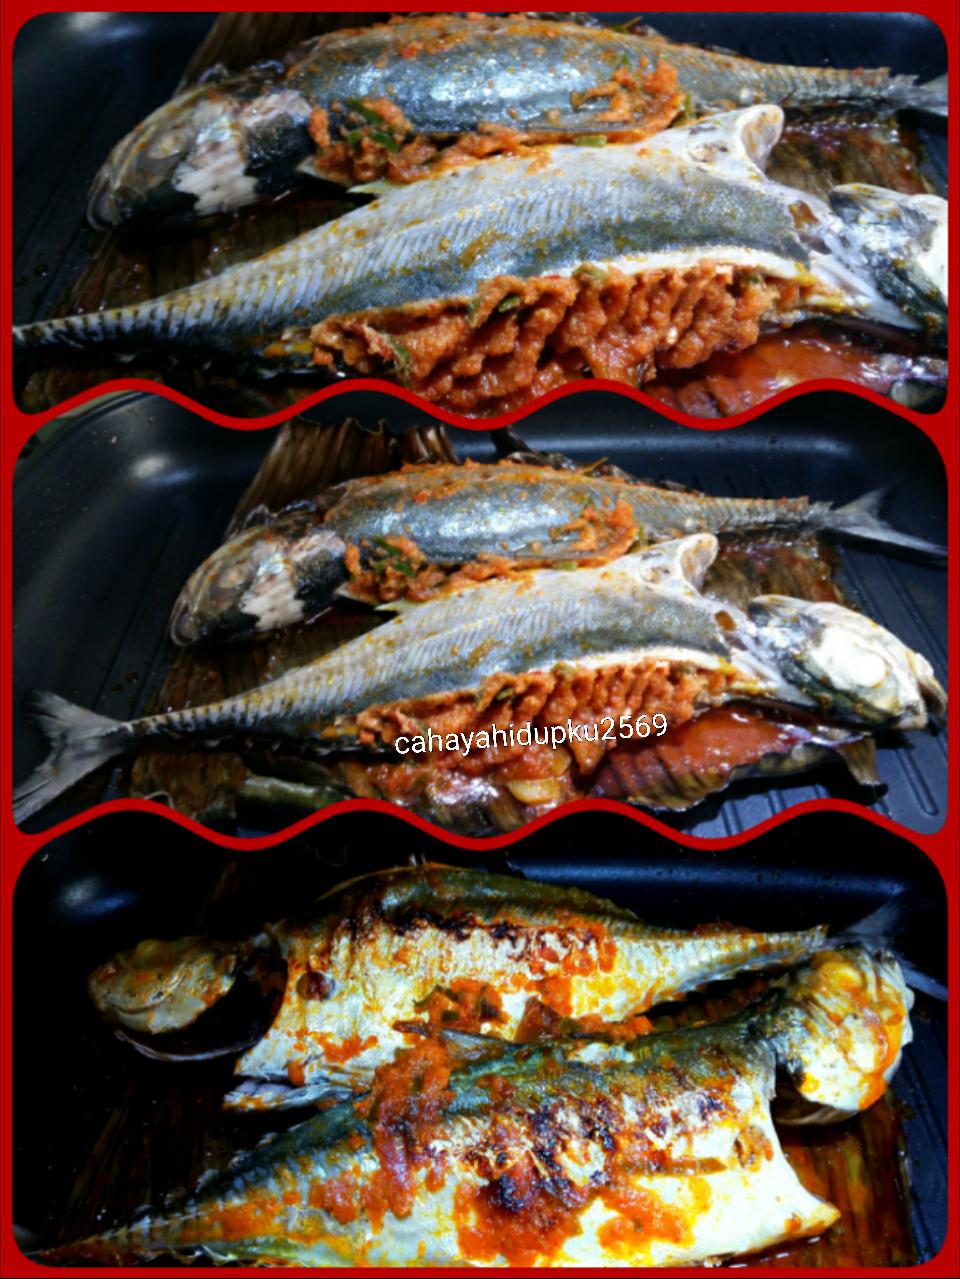 Resepi Ikan Sumbat Sambal Azie Kitchen ~ Resep Masakan Khas